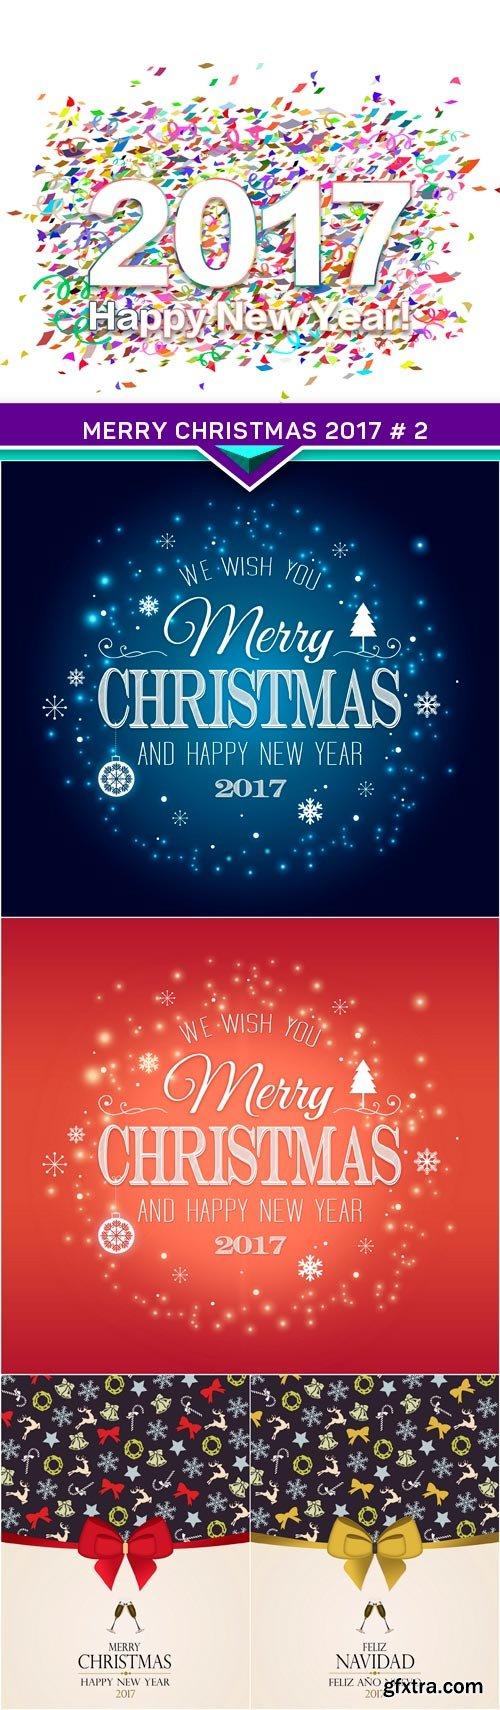 Merry Christmas 2017 # 2 5X JPEG